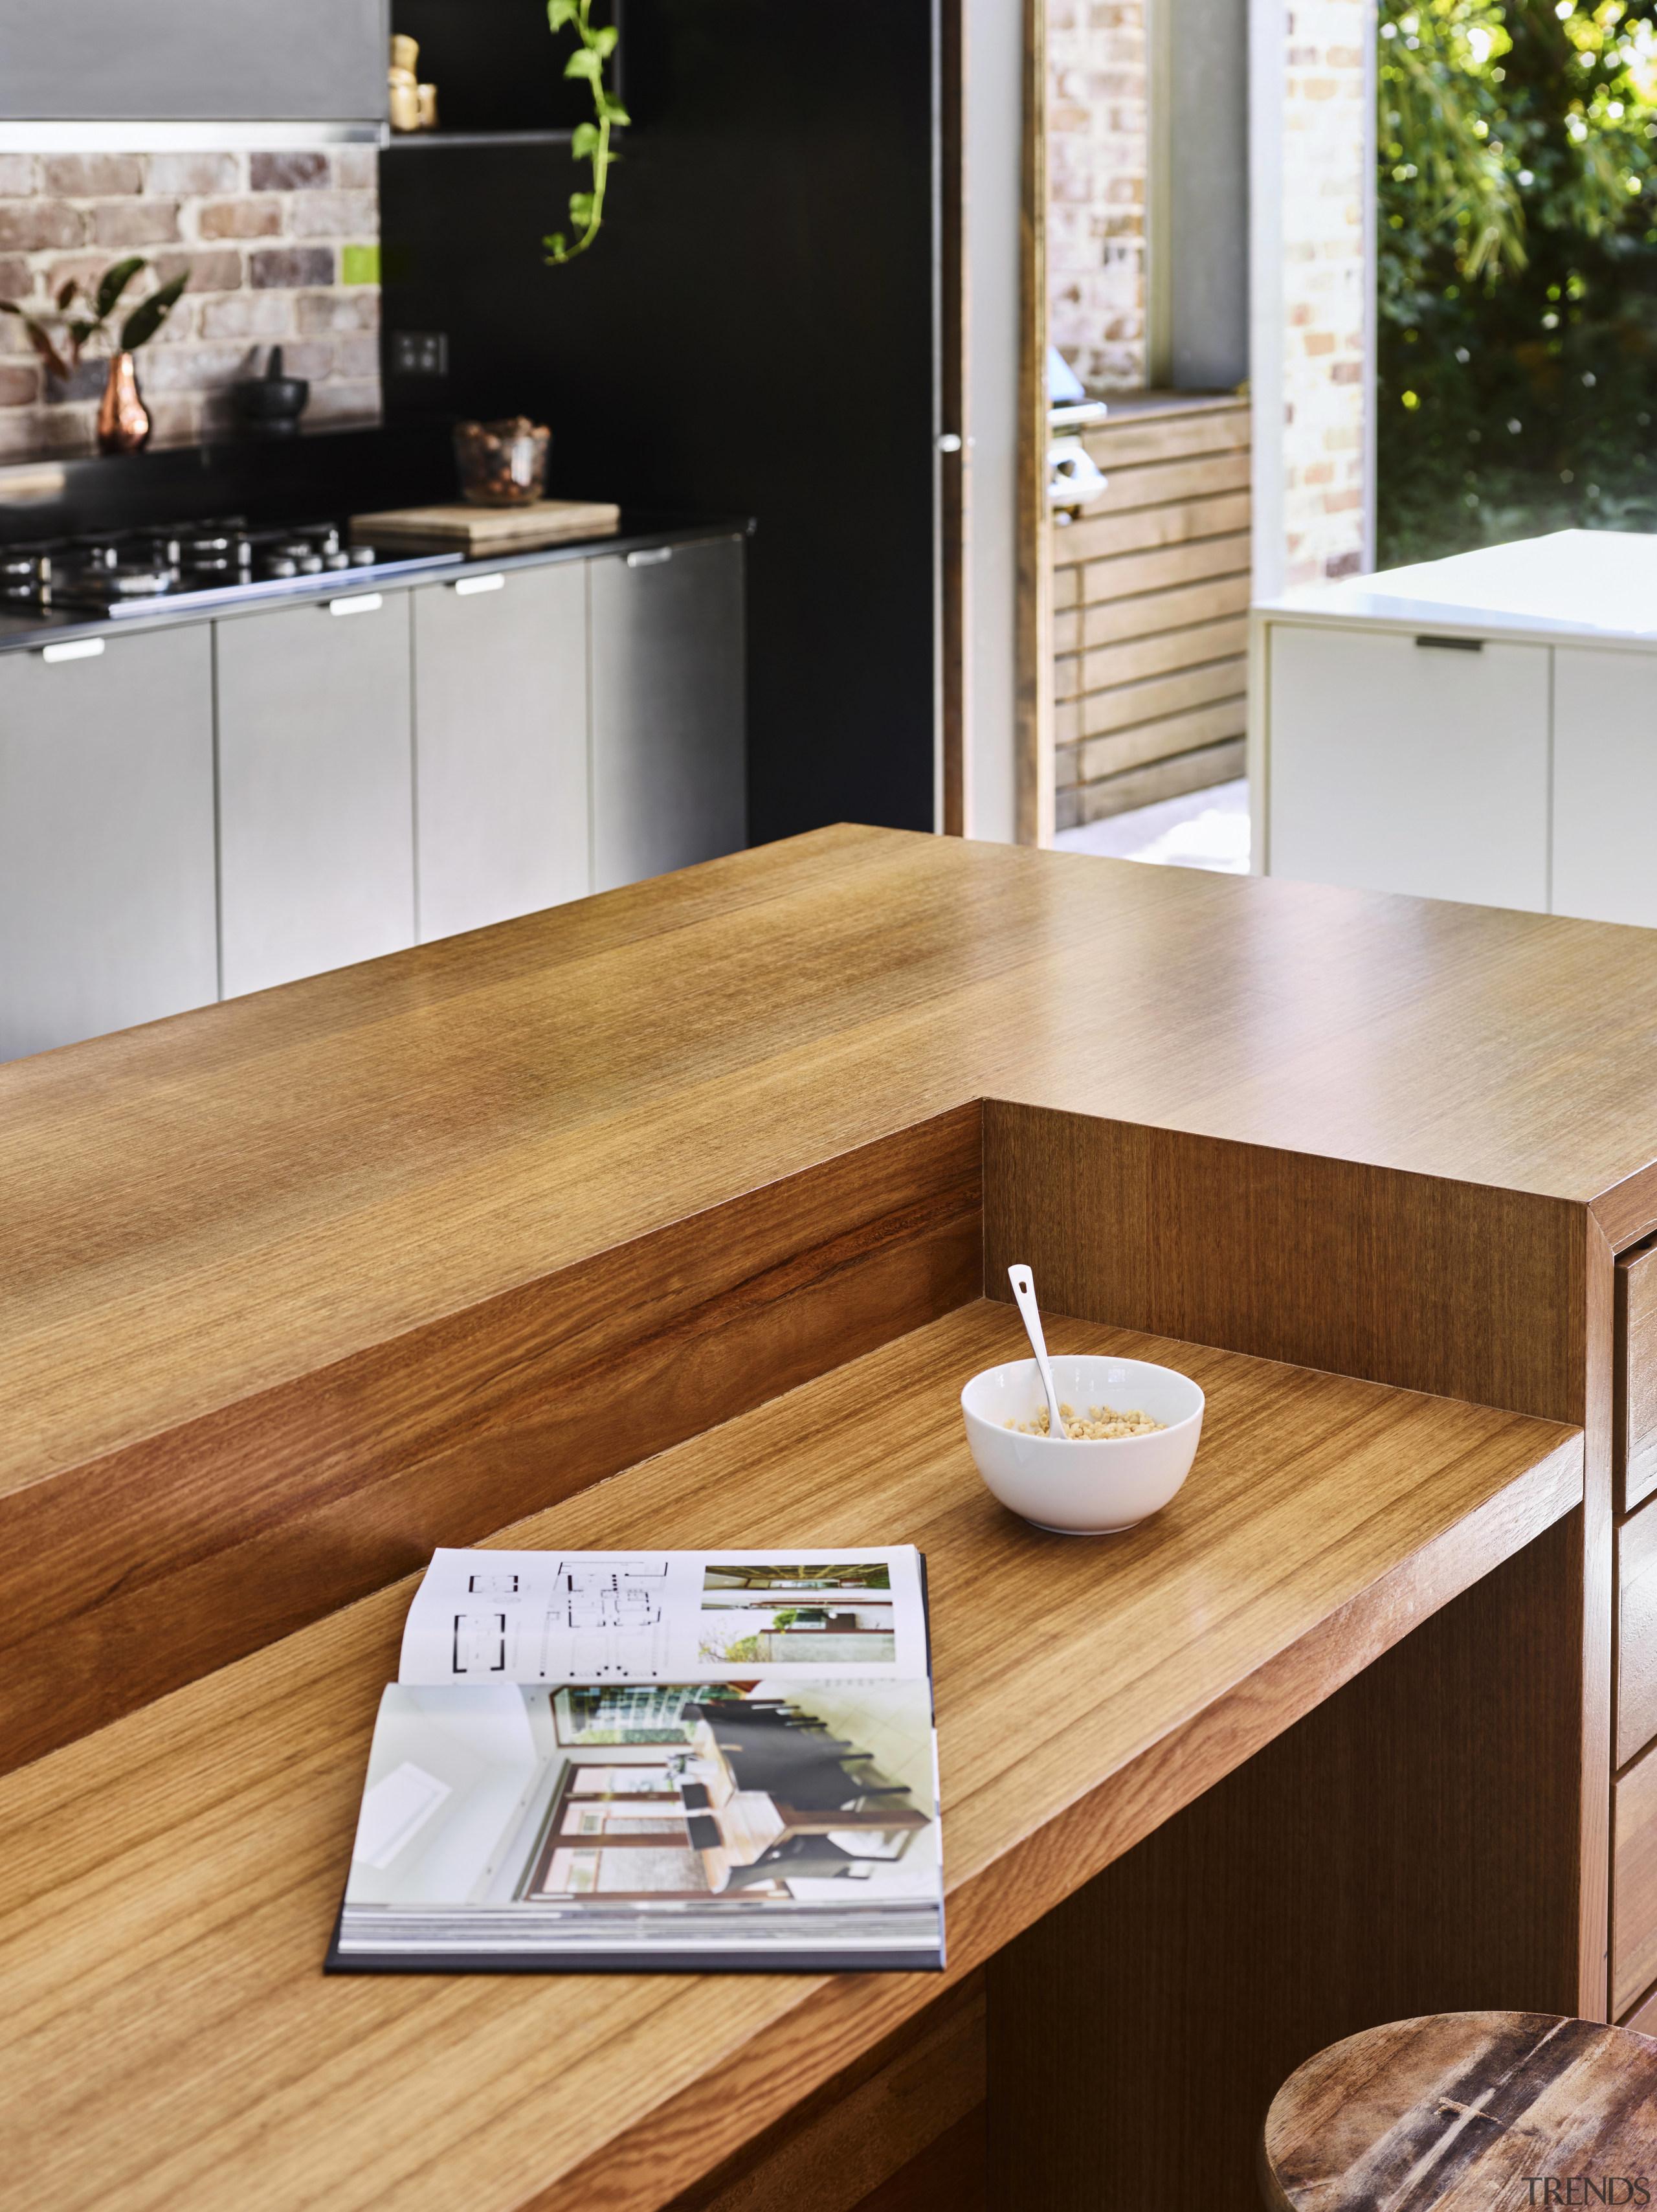 Recycled Tasmanian oak was used to craft this countertop, floor, flooring, furniture, hardwood, interior design, kitchen, product design, table, wood, wood flooring, orange